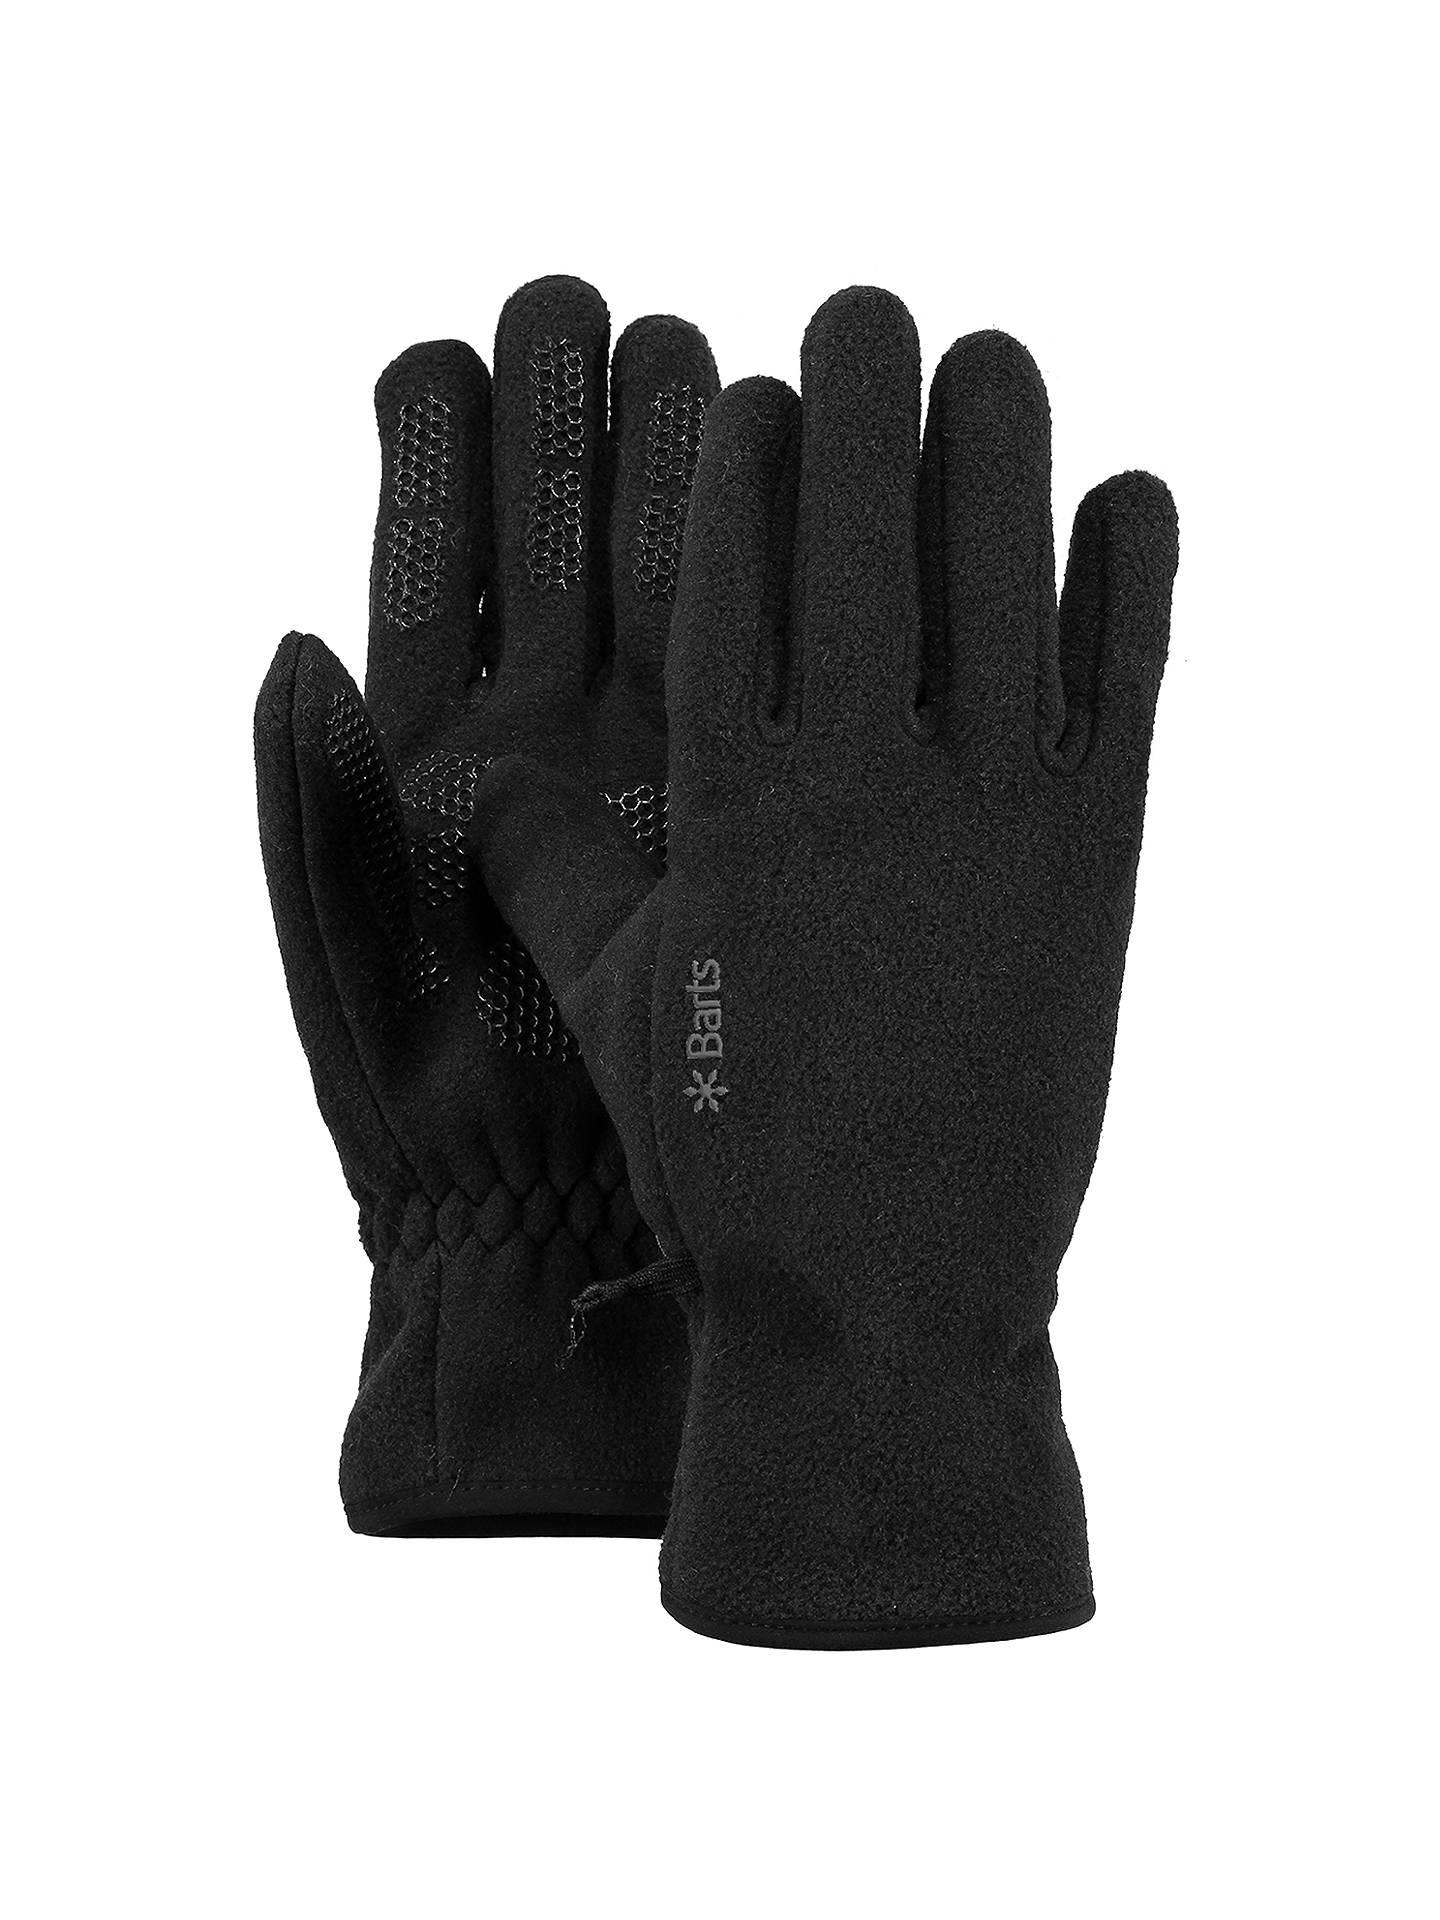 6405345a341 Barts Fleece Gloves, Black at John Lewis & Partners